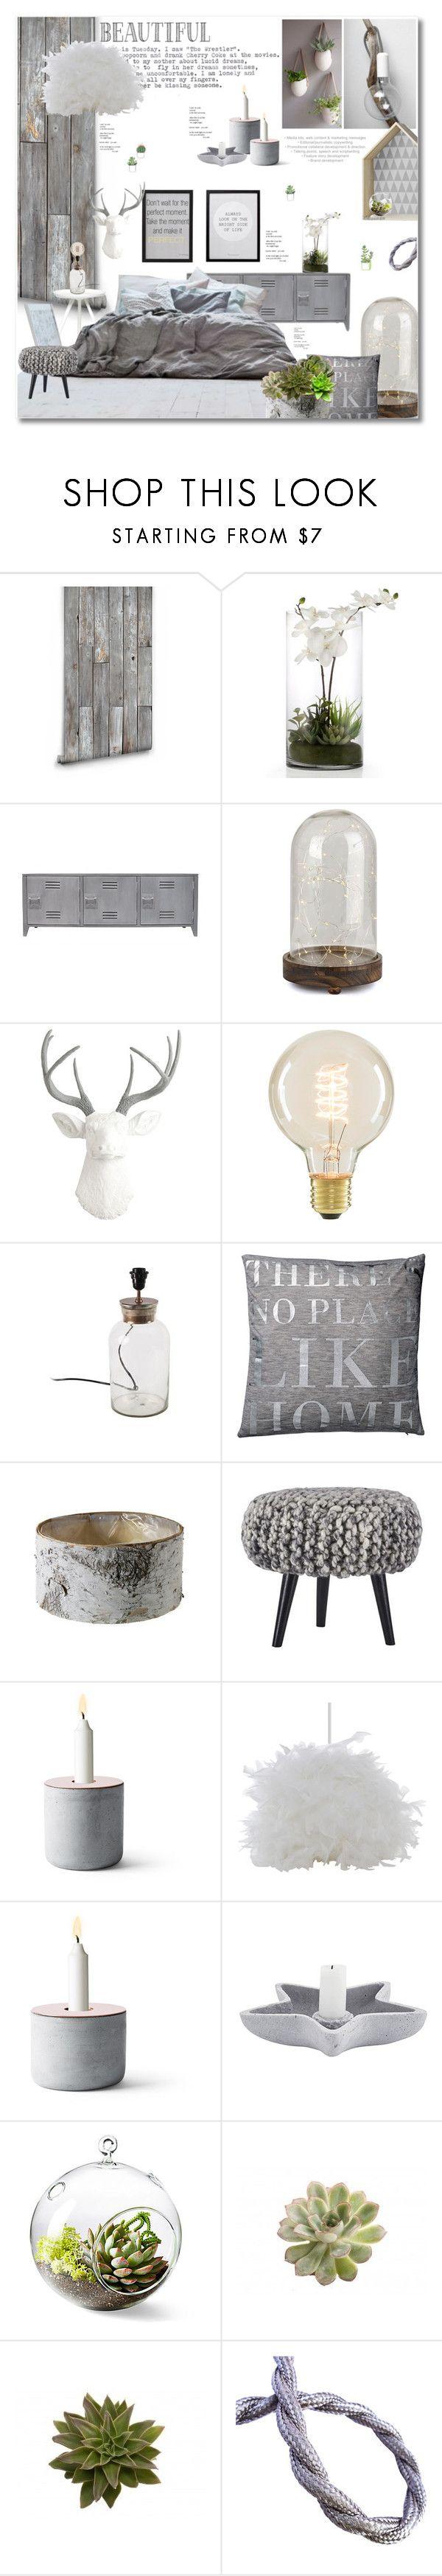 best 25 midcentury bedroom decor ideas only on pinterest